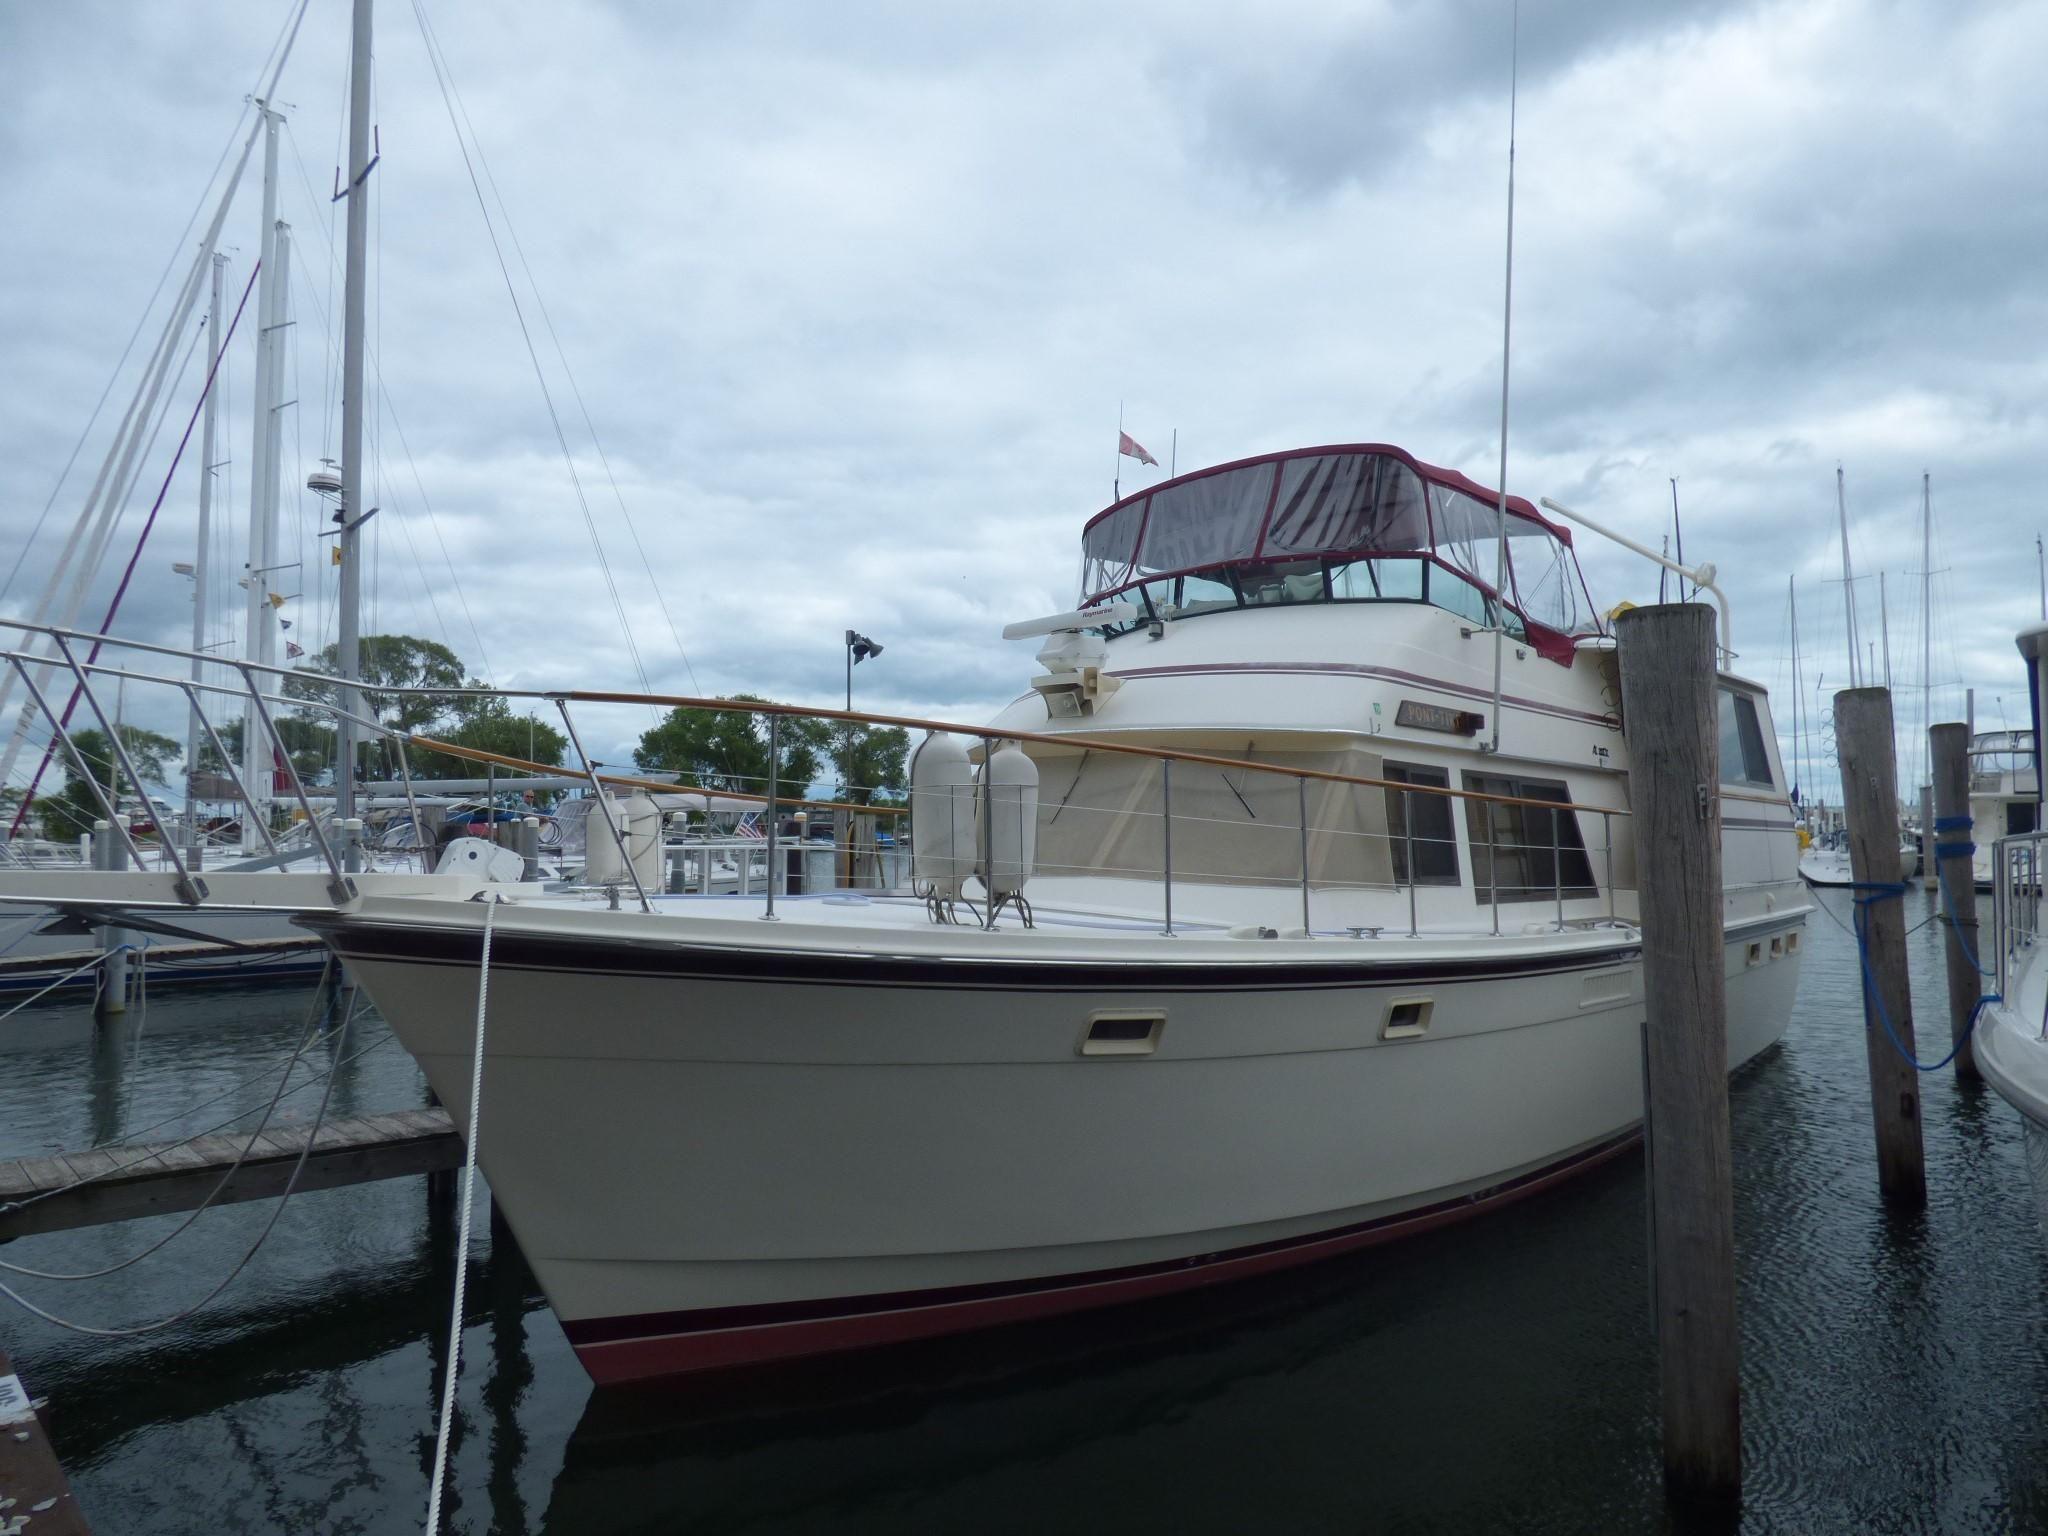 47 Atlantic Motor Vessel: 1985 Atlantic 47 MY Power Boat For Sale